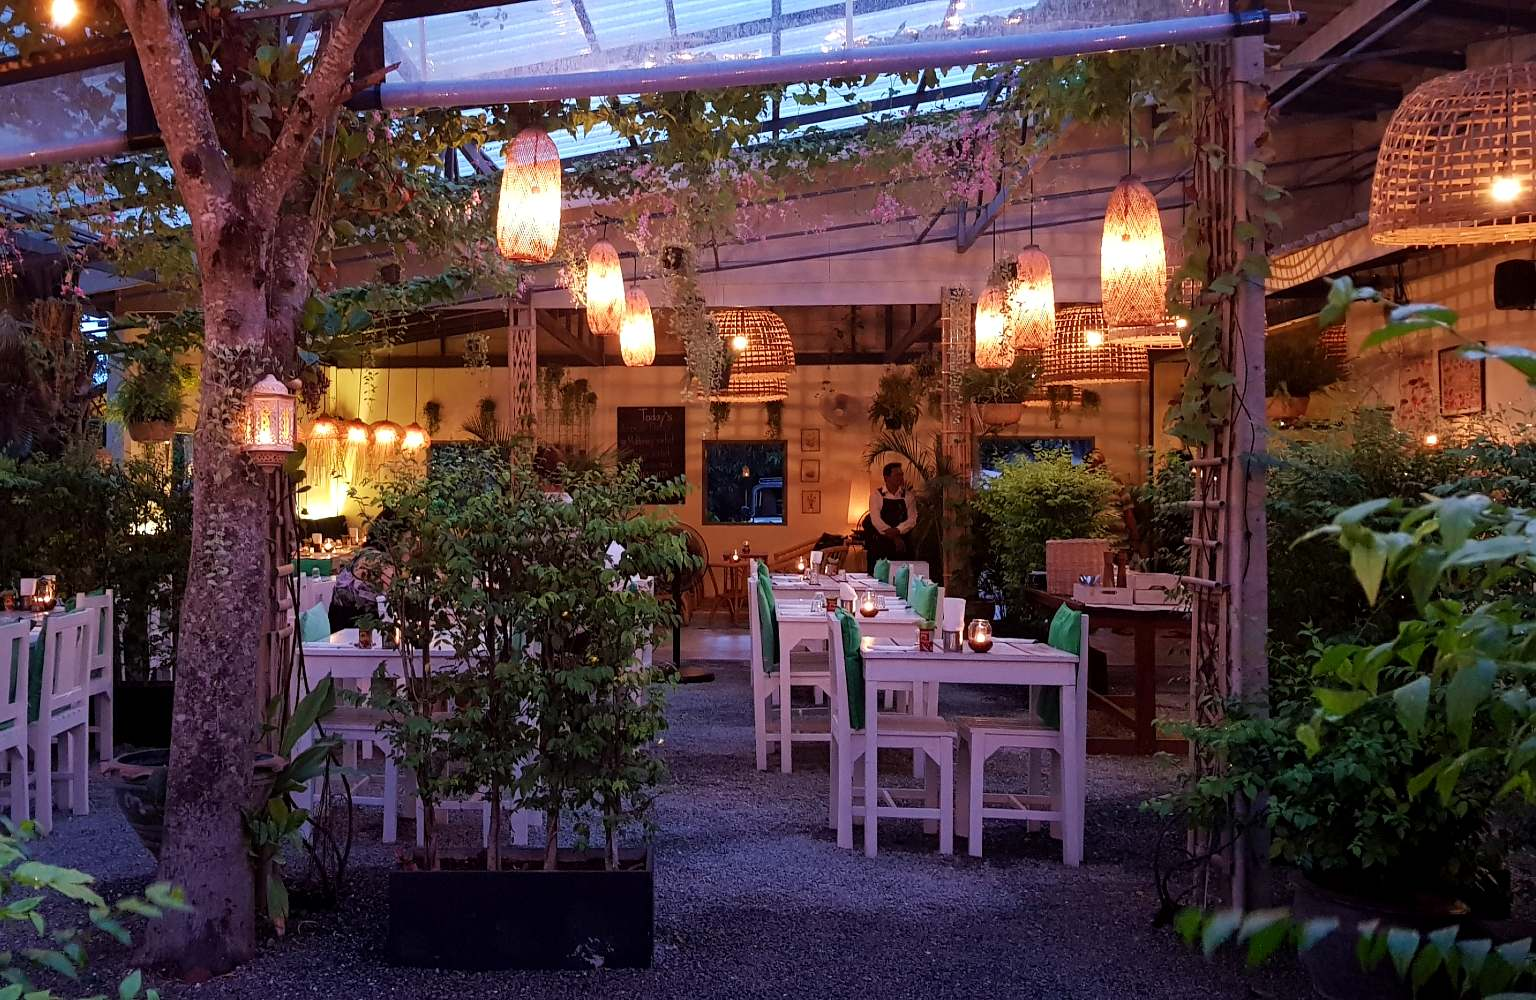 The garden and restaurant of Yang Garden on Koh Lanta, one of the best restaurants on koh lanta!